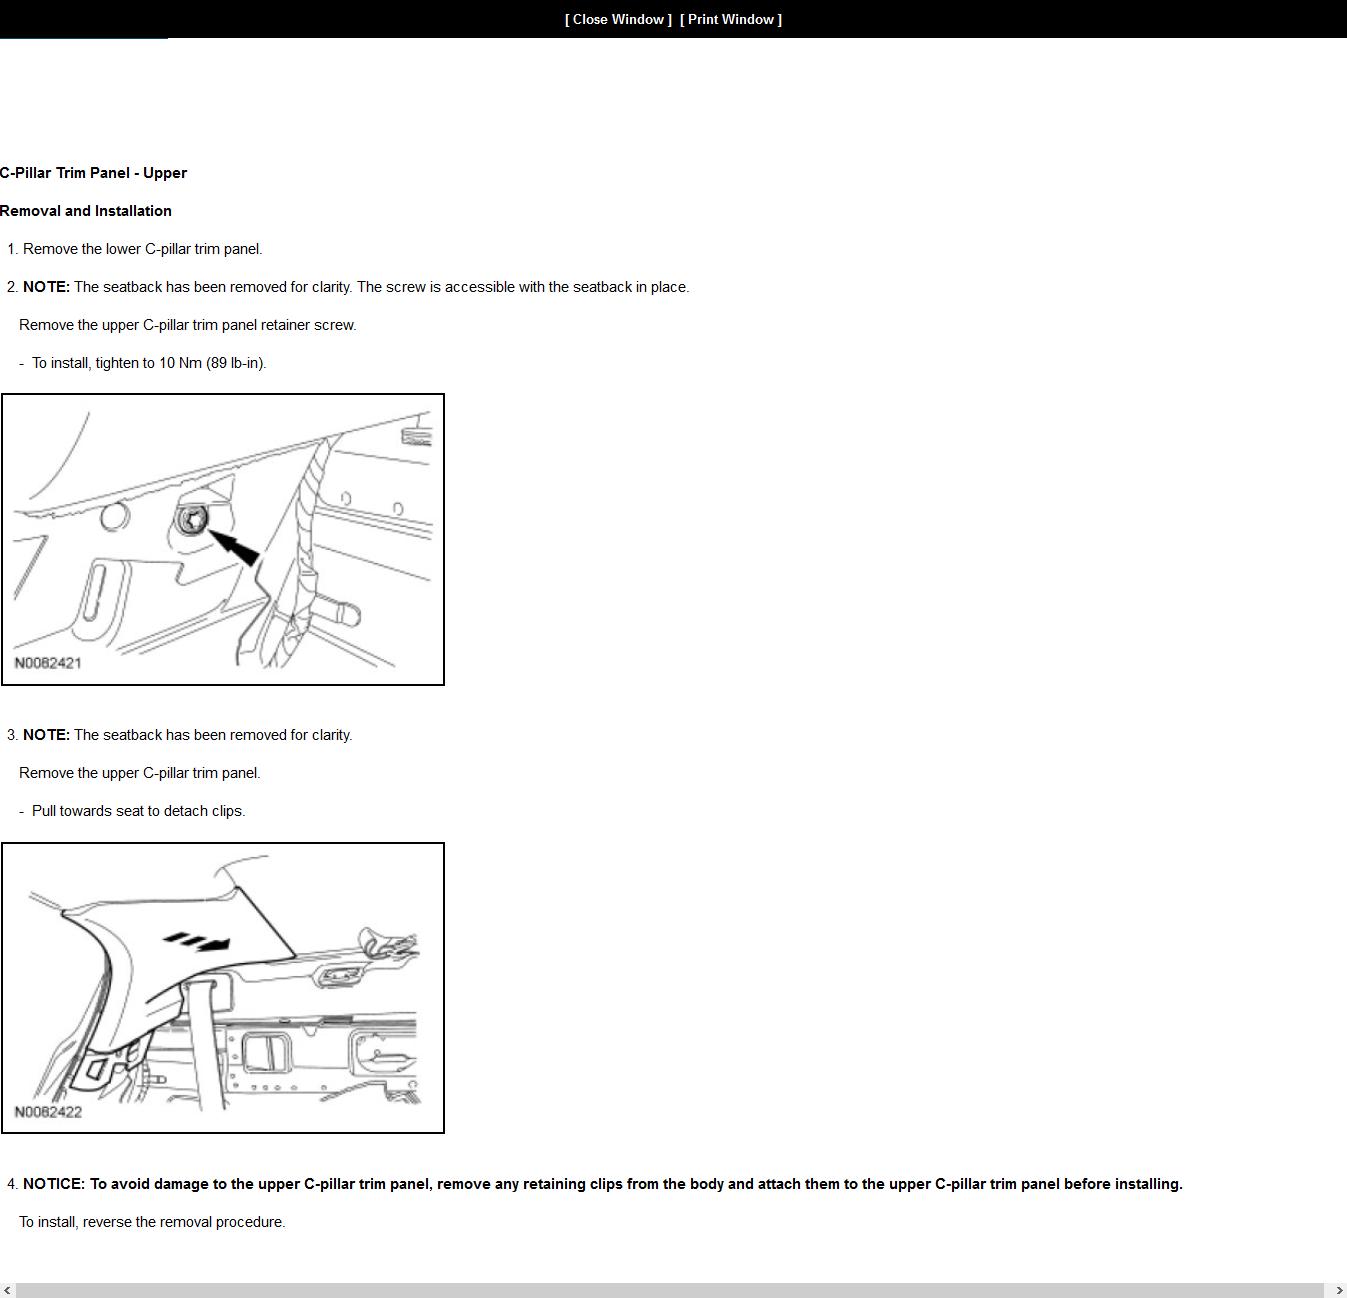 2010 Lincoln Mkz Wiring Diagram Great Design Of Mkx Radio Navigator Mks Mkt